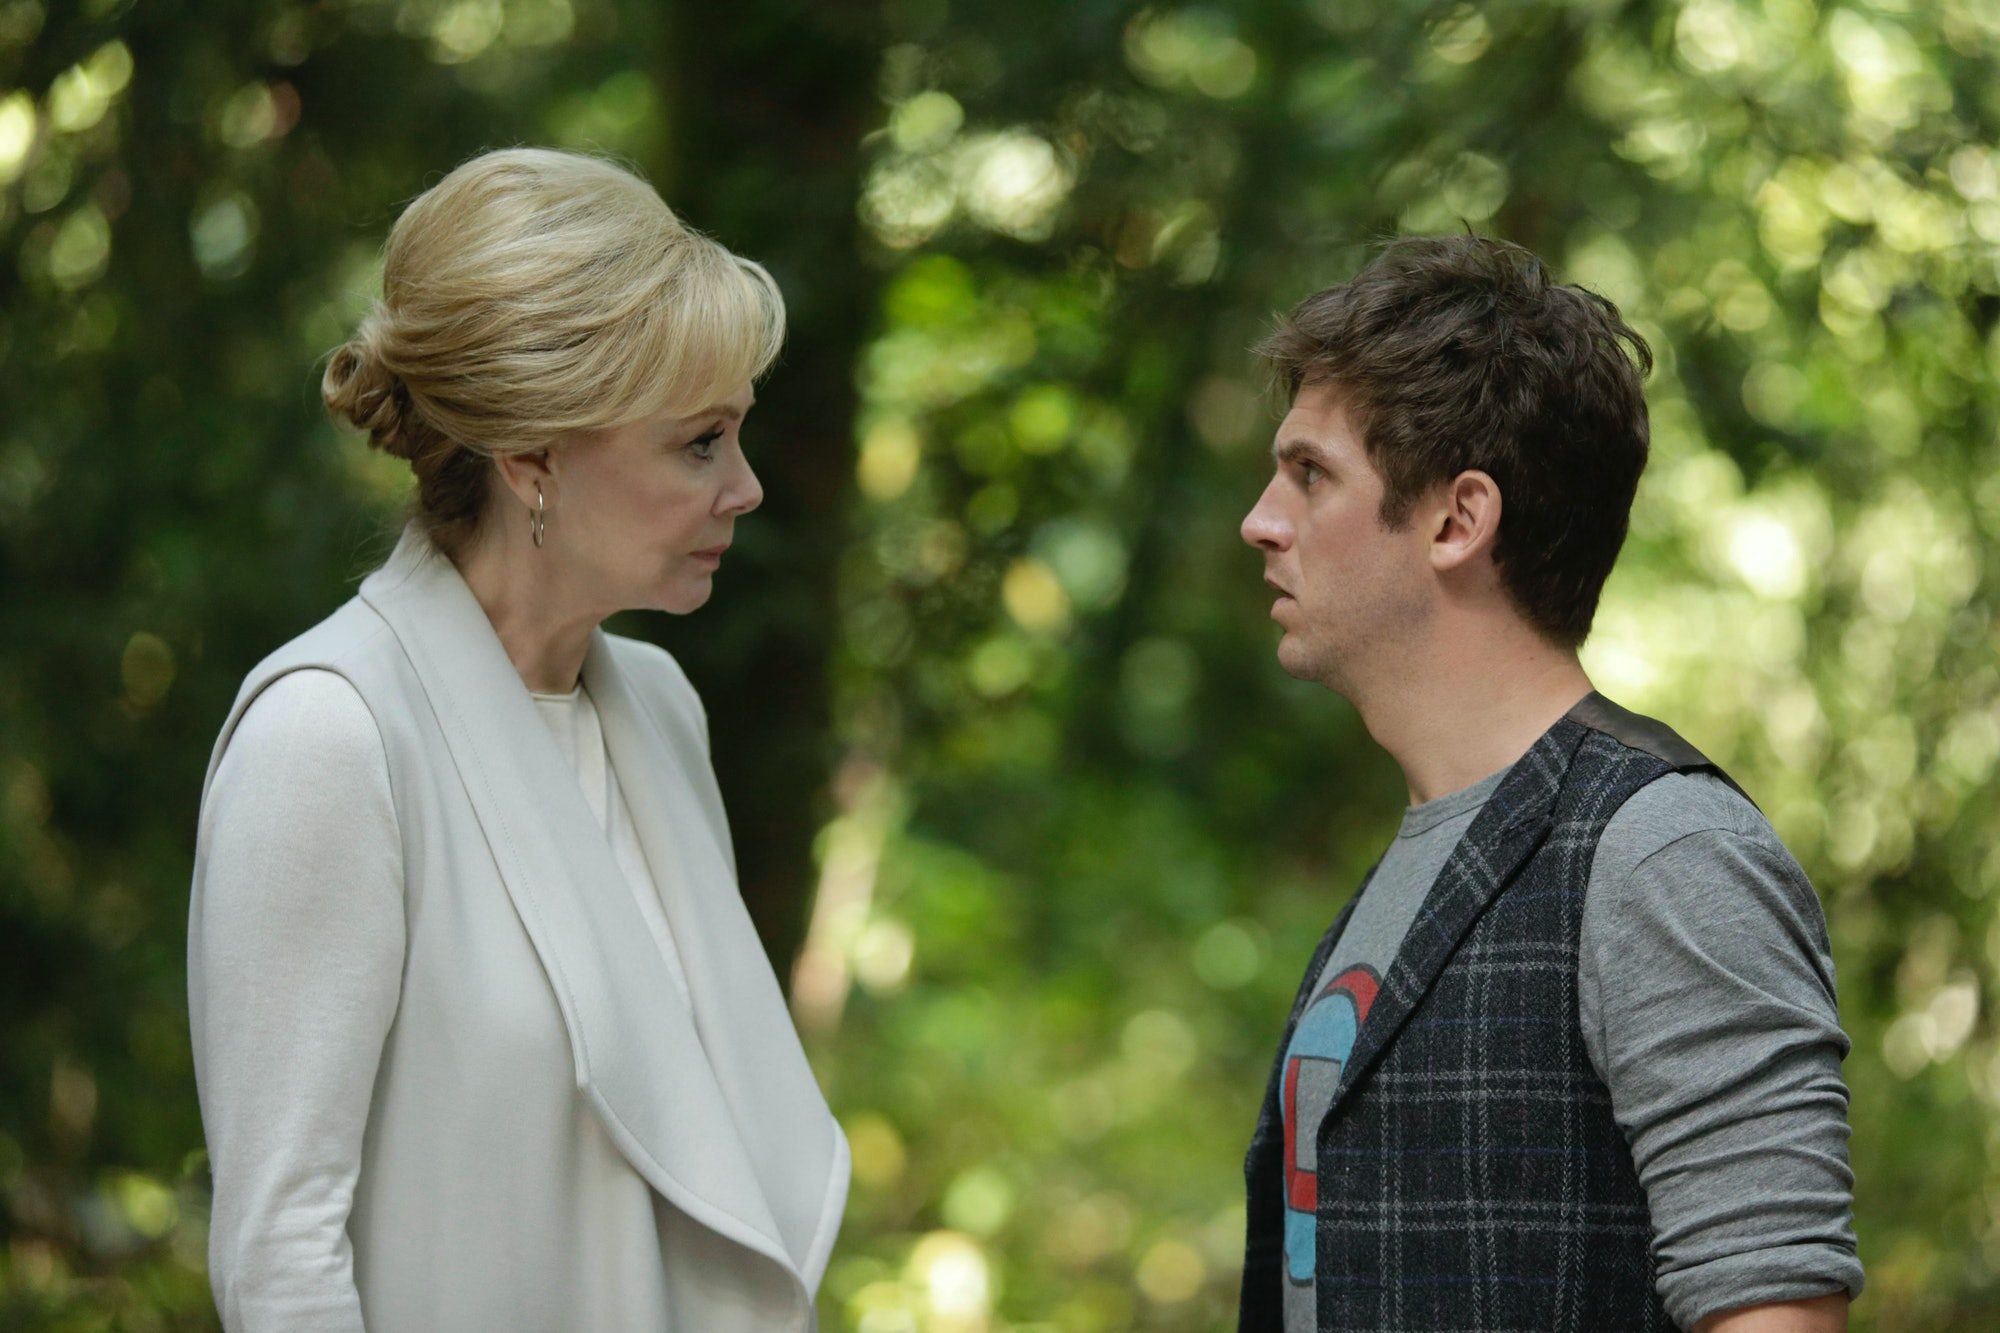 Melanie Bird and Dan Stevens as David Haller in 'Legion'